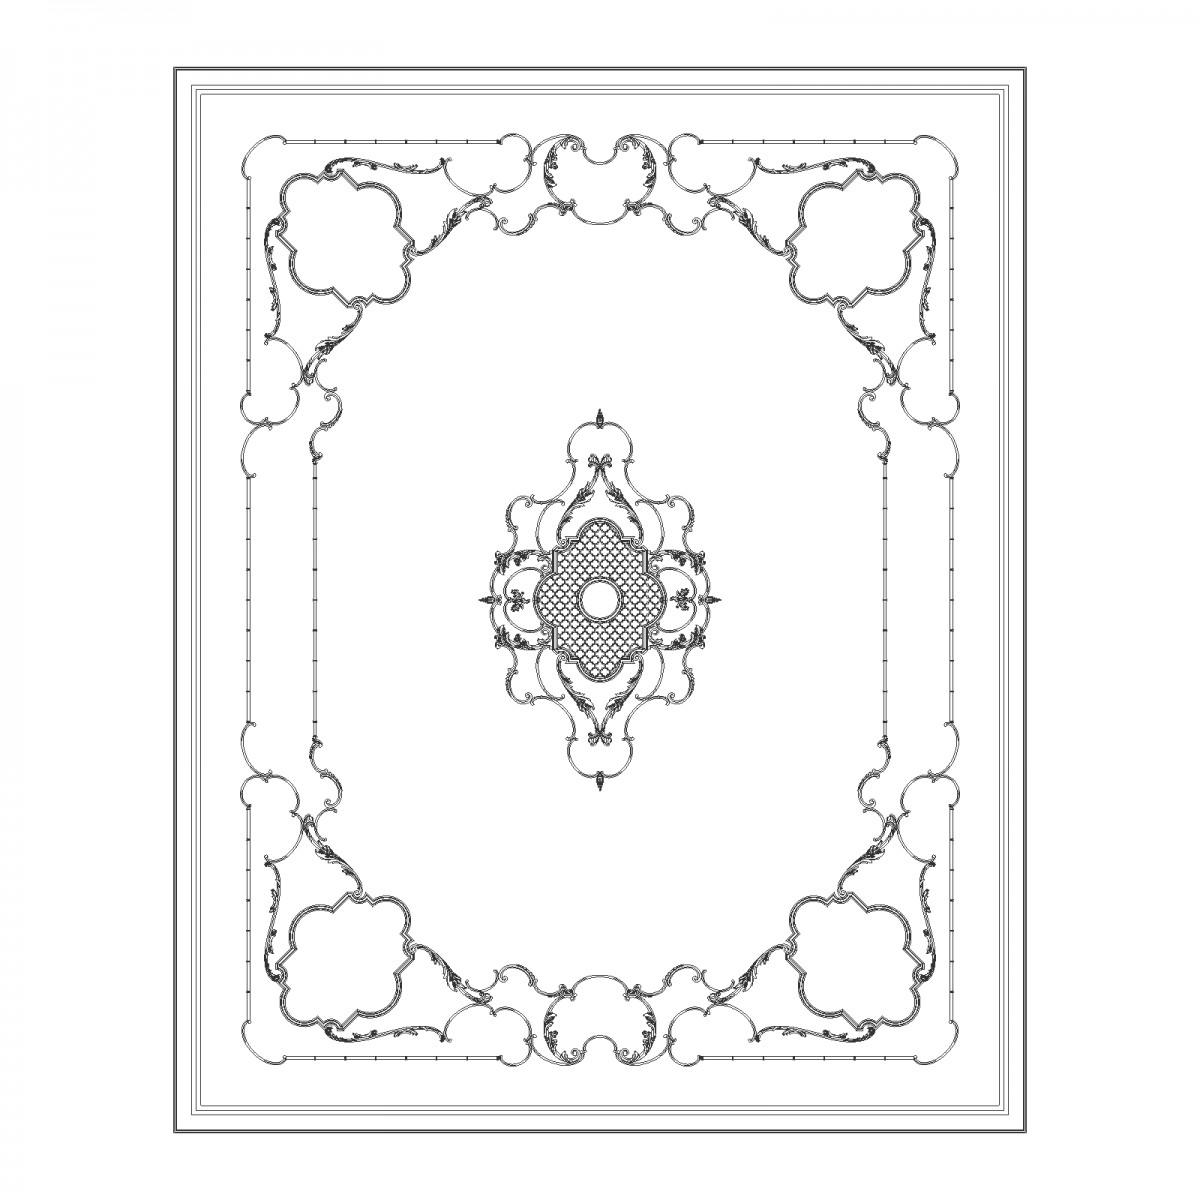 Потолок RODECOR Камелия Ф2 88012CN